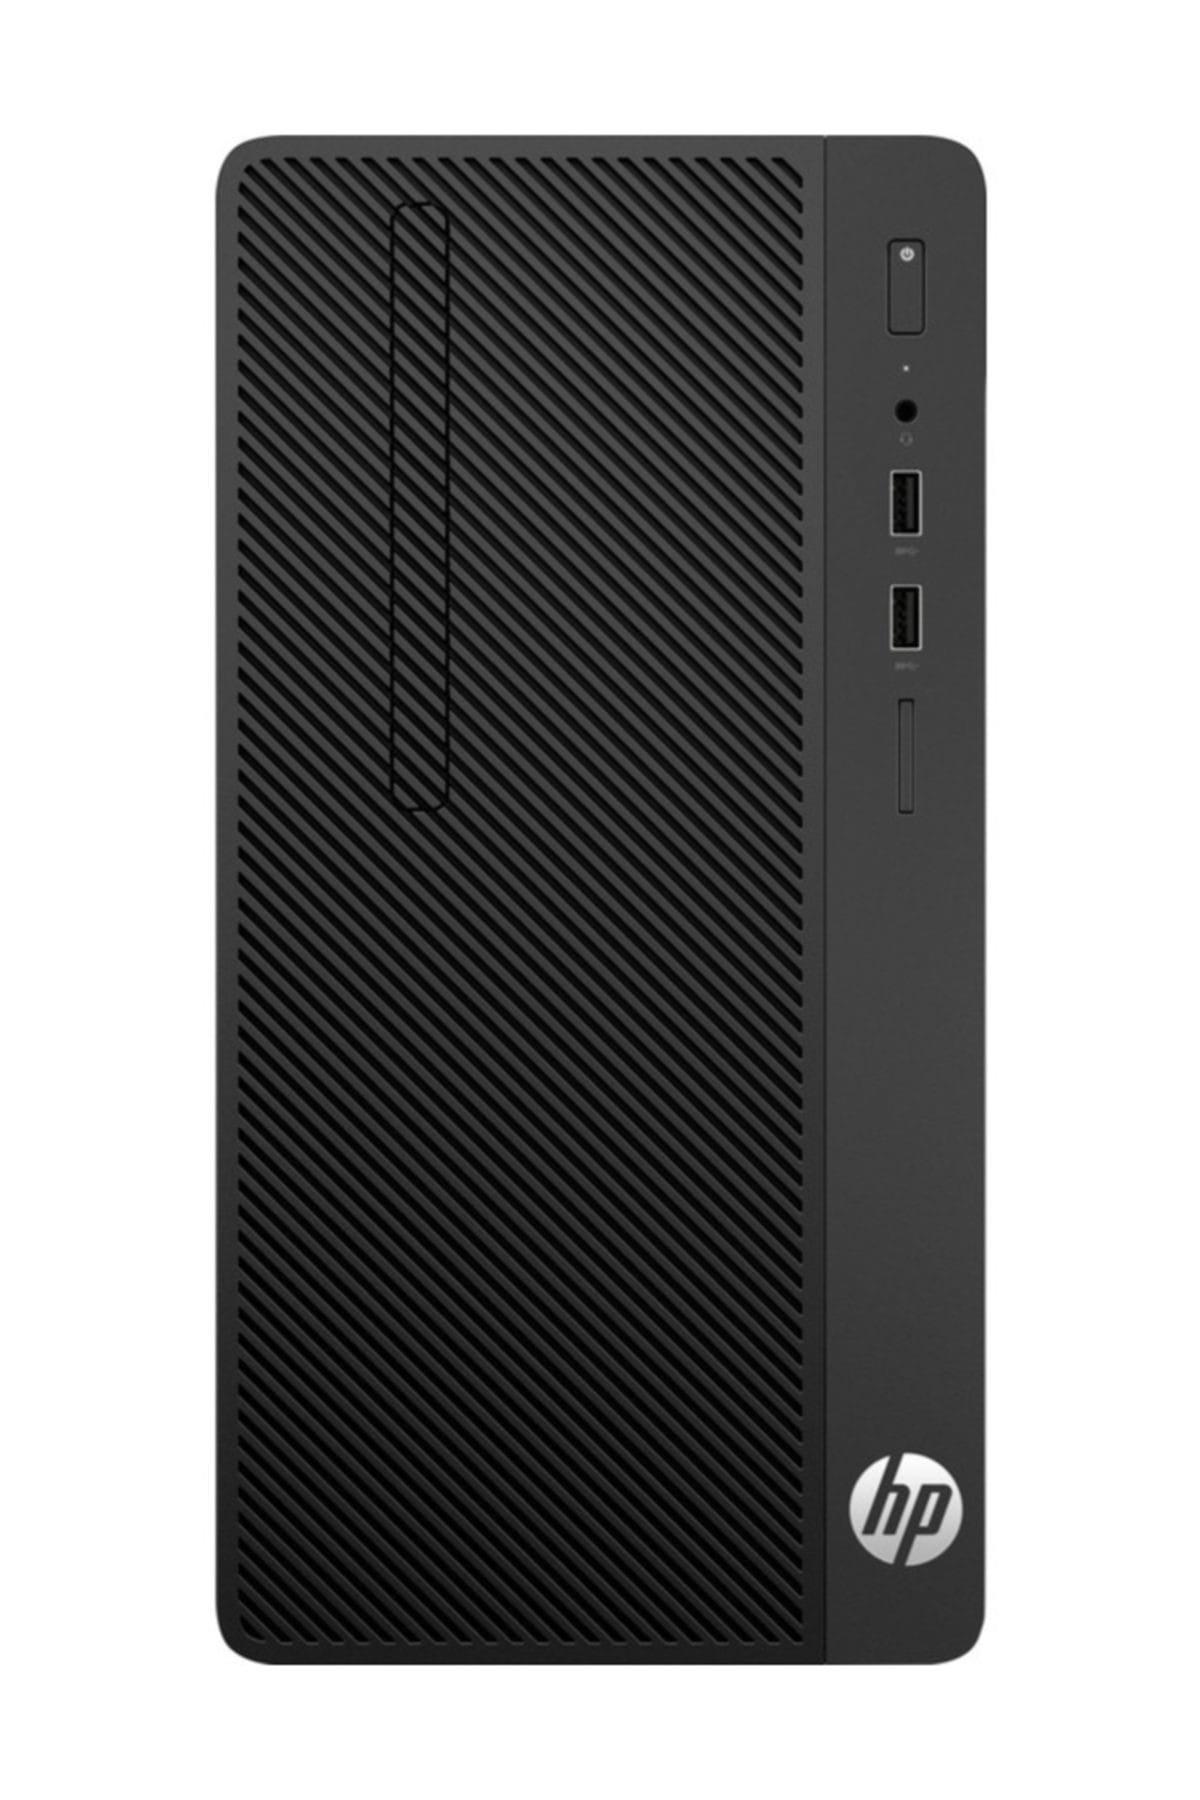 HP 280MT 4CZ69EA i3-7100 4BG 1TB FreeDOS 1